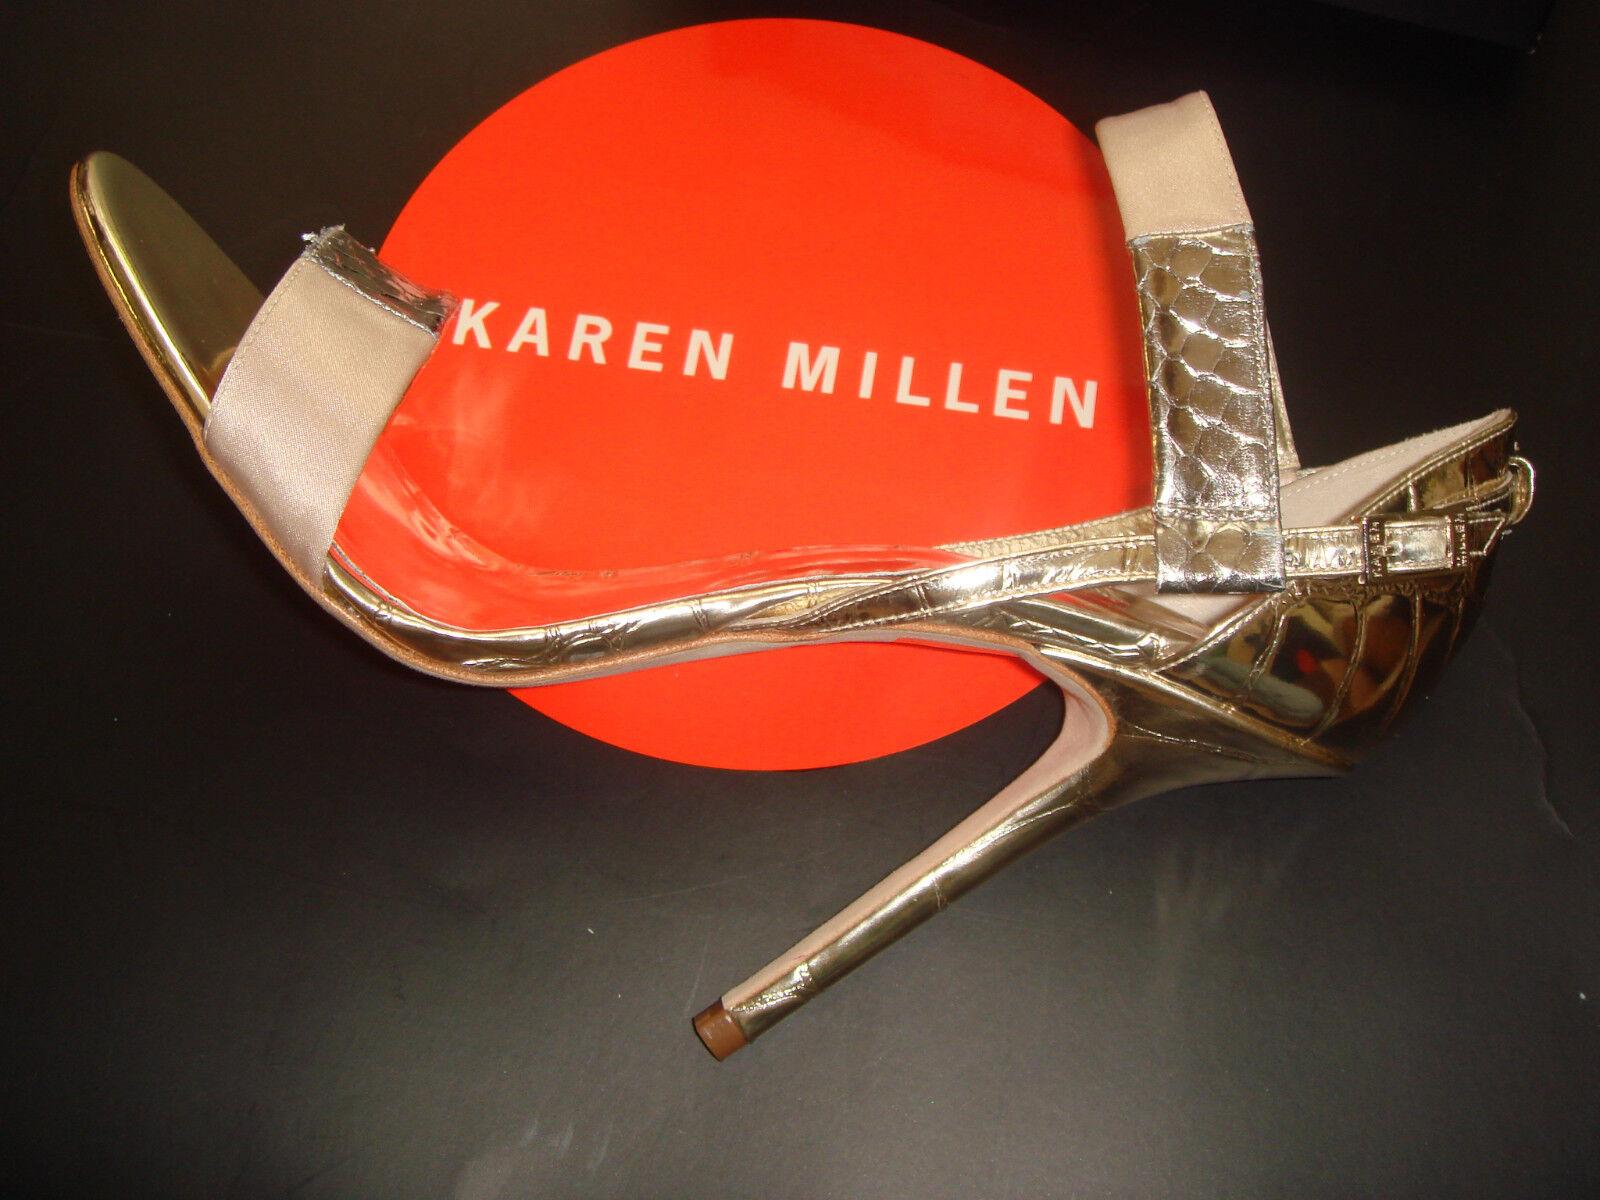 BNWB Karen Millen Argento Oro Argento Millen Metallico Neutro Color Carne Scarpe Rosa 40/7 c56426